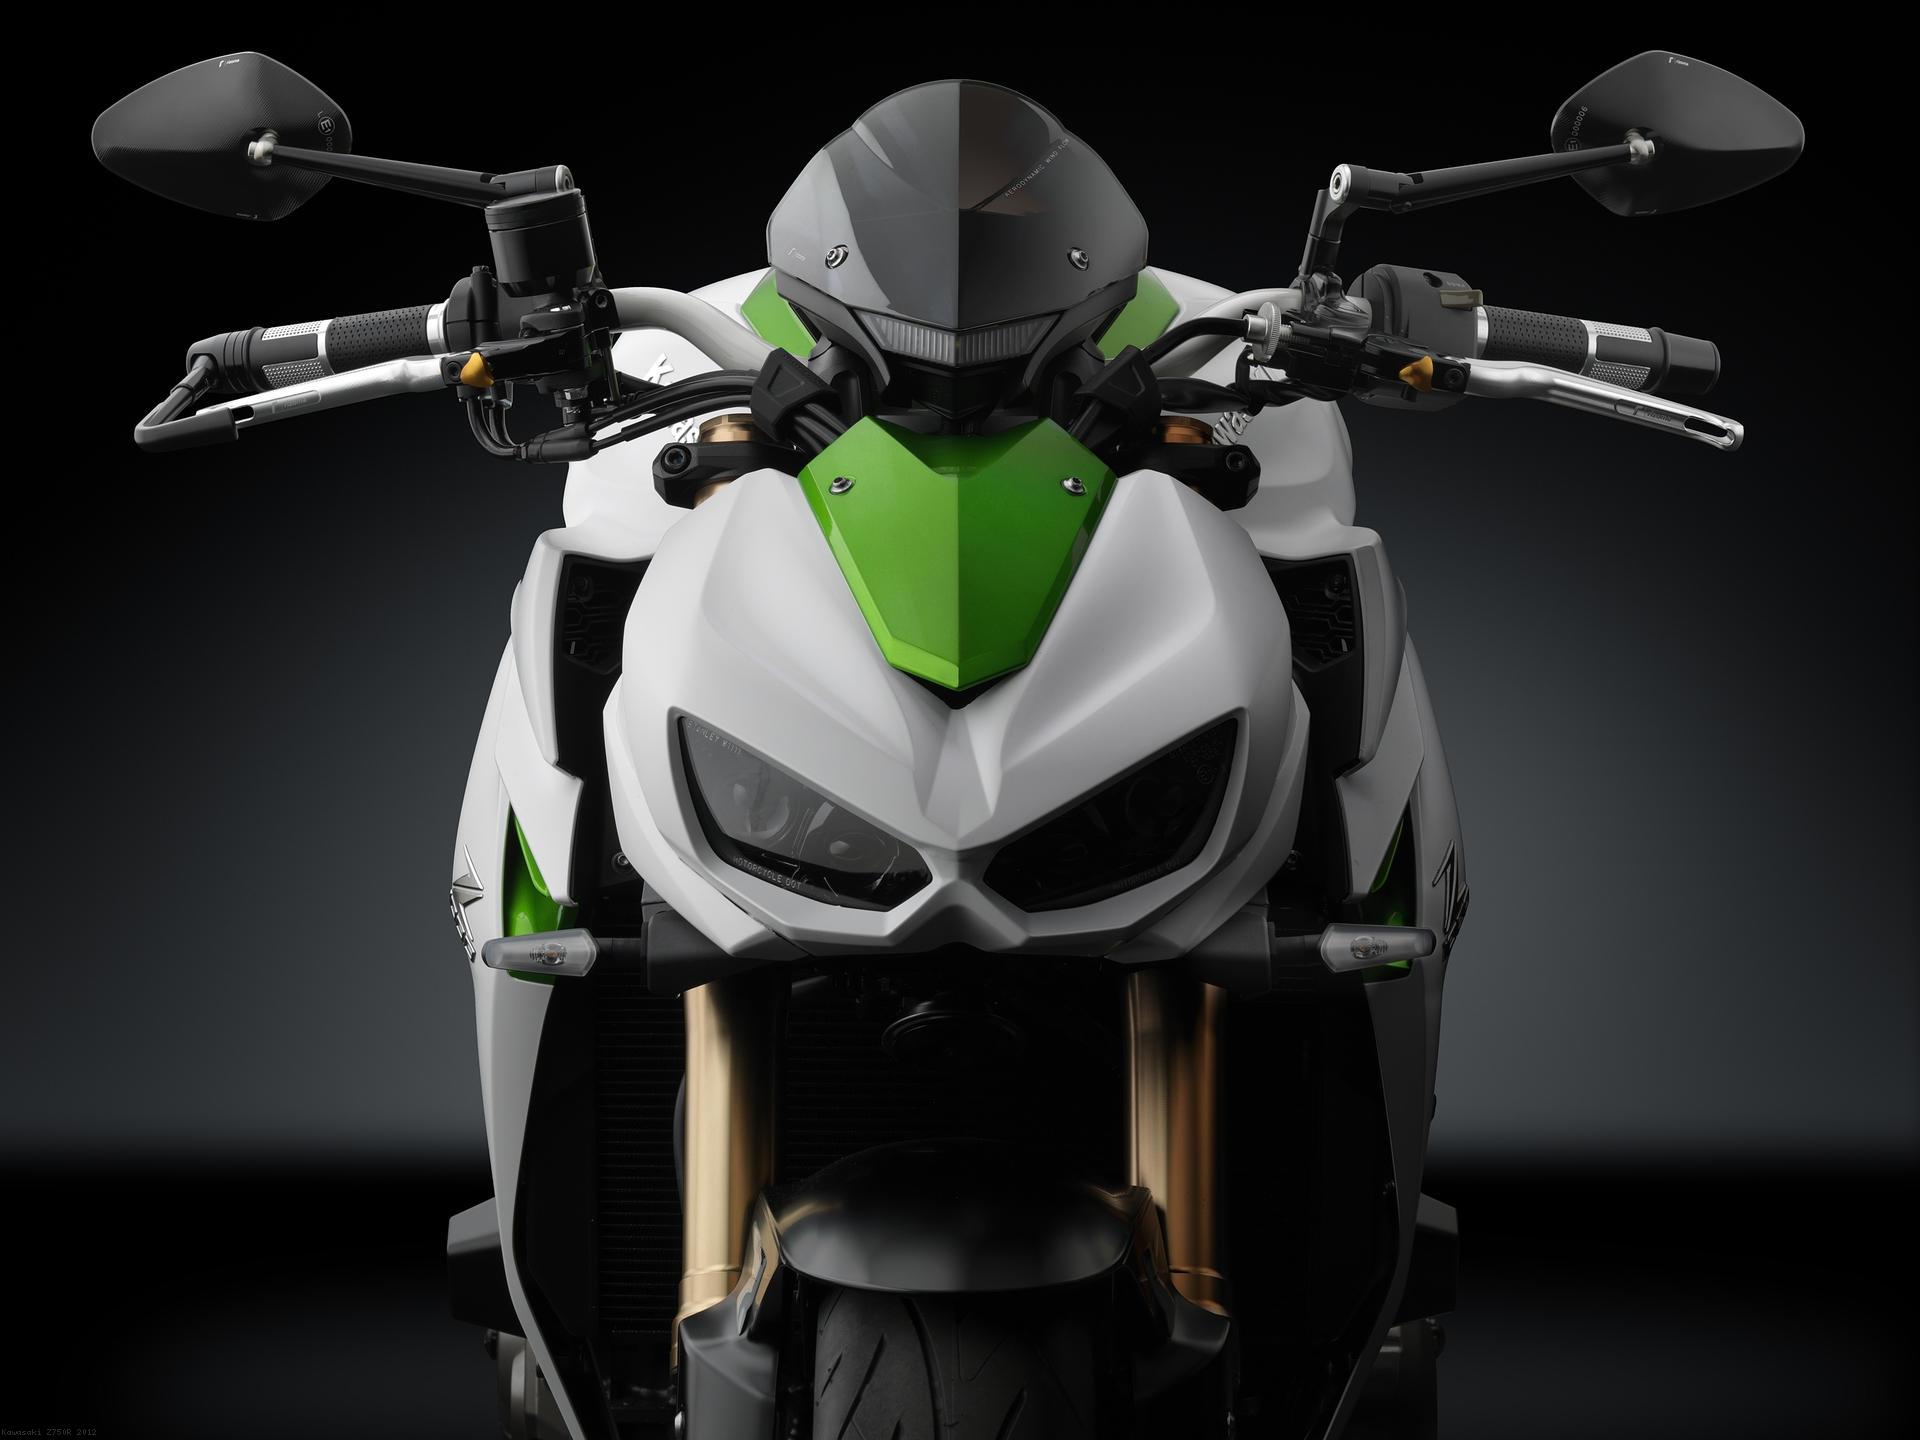 Rizoma Brake Fluid Tanks For Select Honda Kawasaki Models Z750R 2012